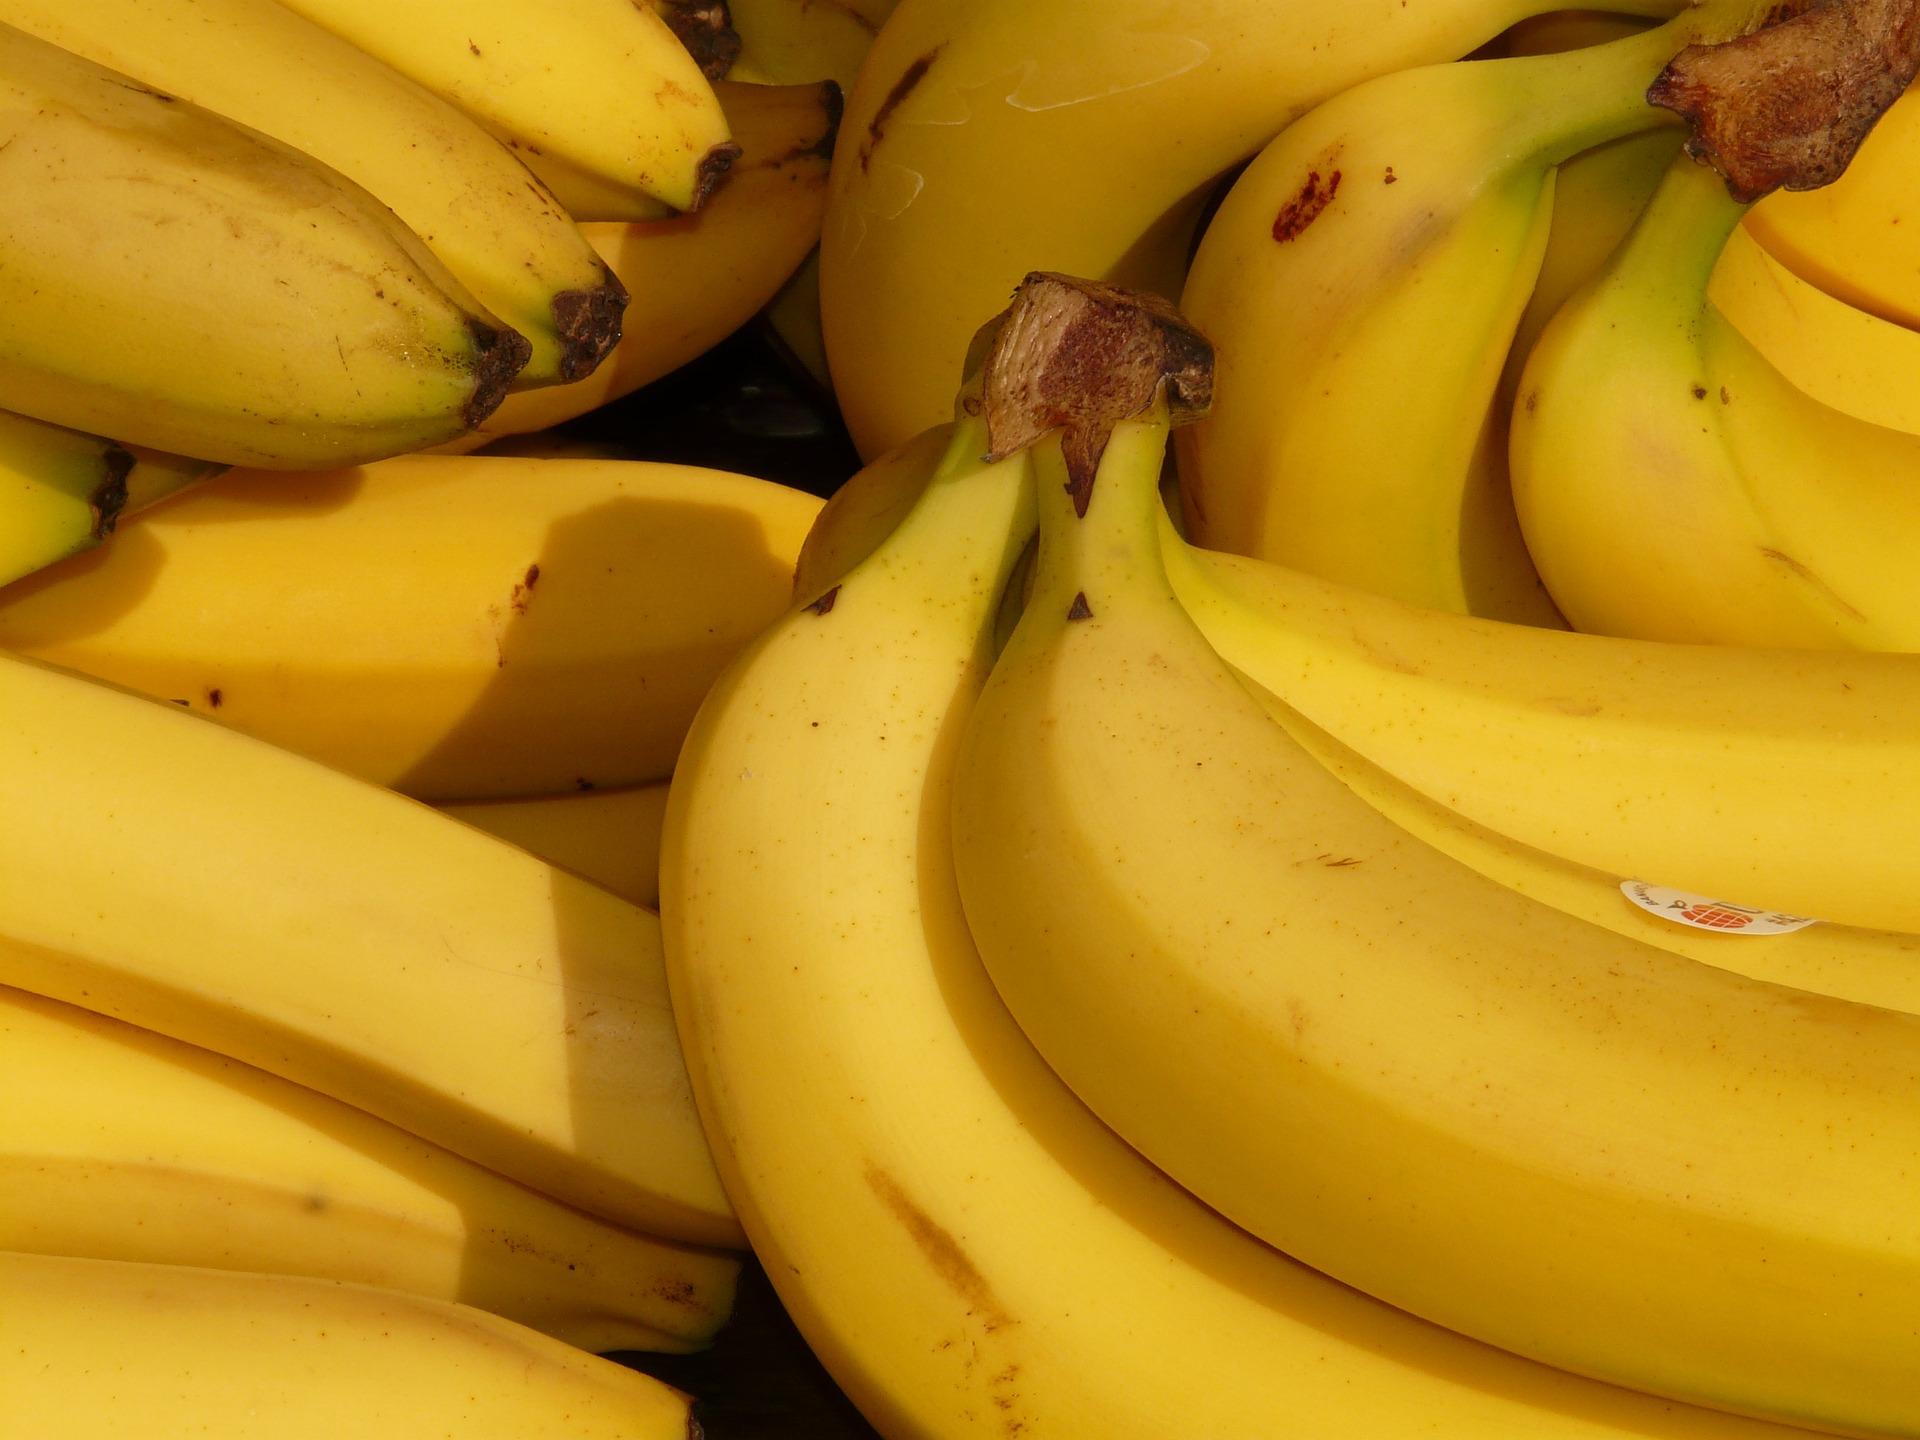 banana-5734_1920.jpg